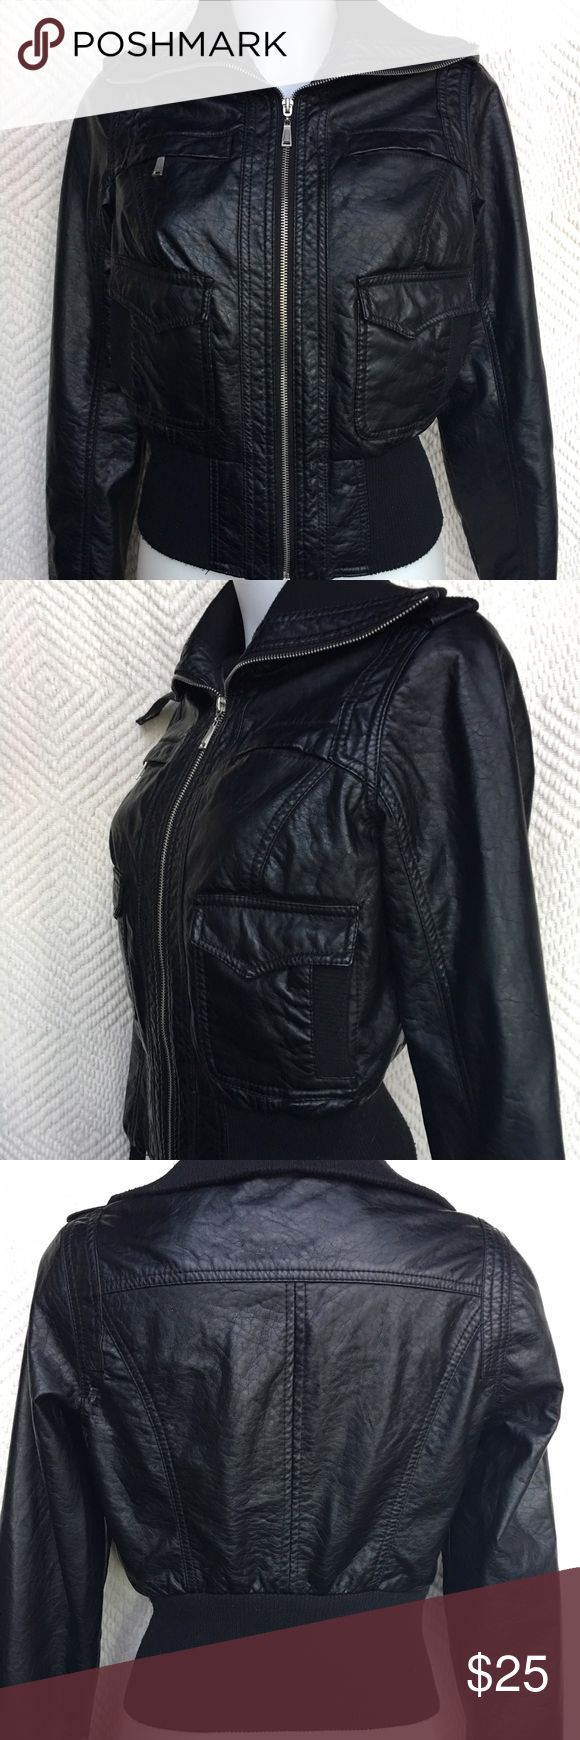 Black bomber jacket Women's size medium black bomber jacket Jackets & Coats